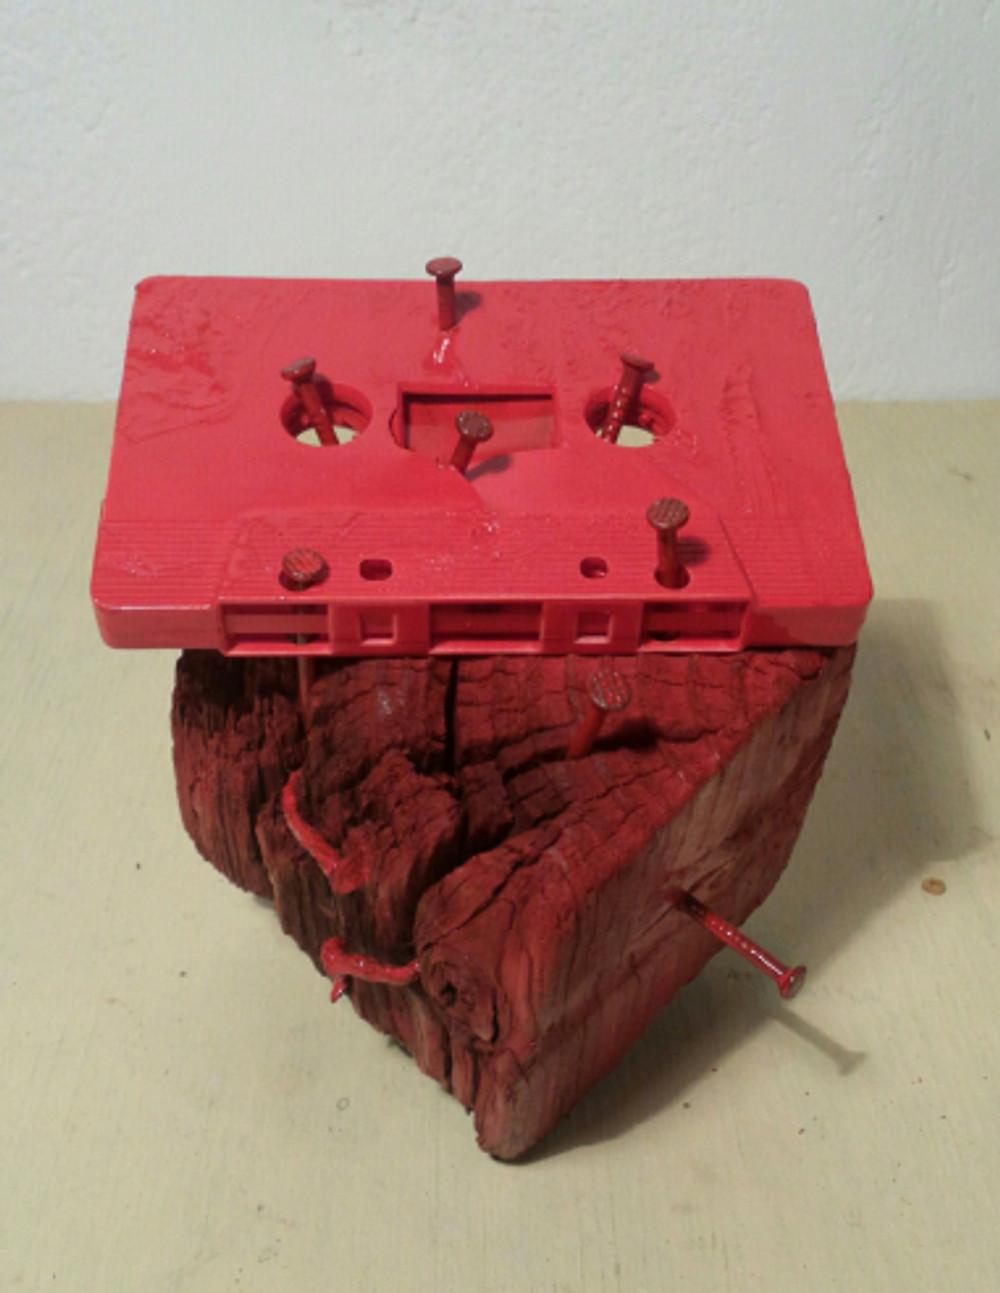 05 karl & rene - mai 12 asaotpu anti-cassette (wood, cassette, nails, paint)